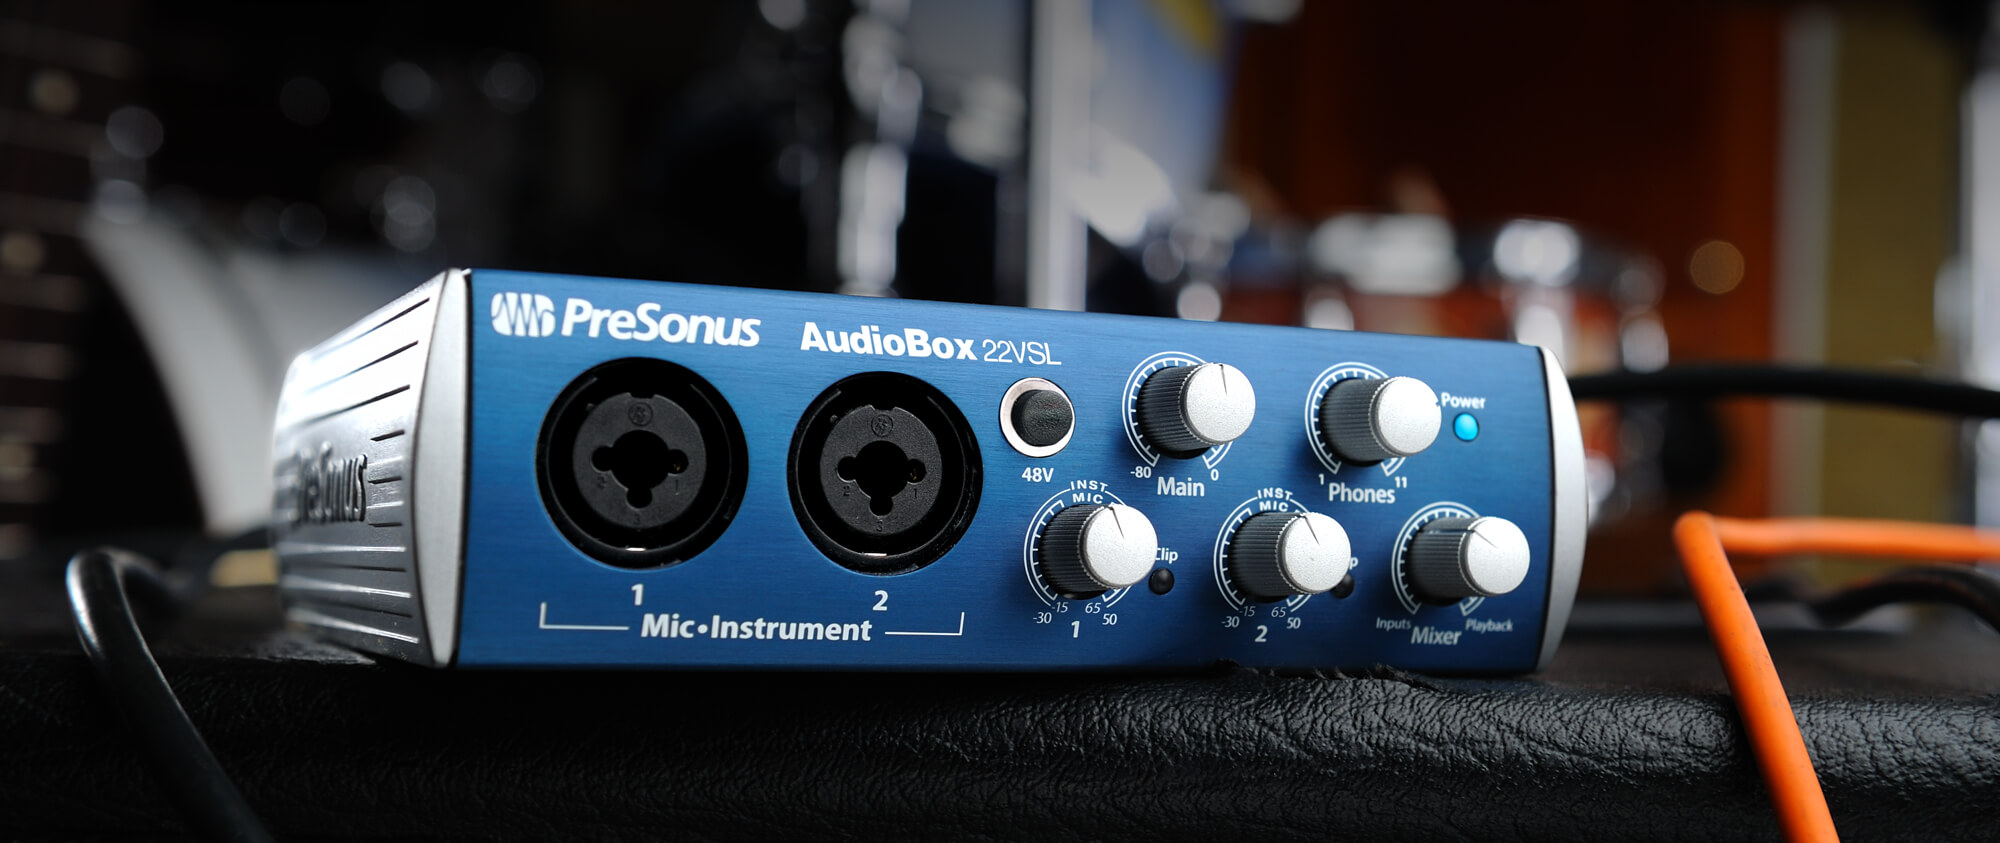 Audiobox usb   presonus.